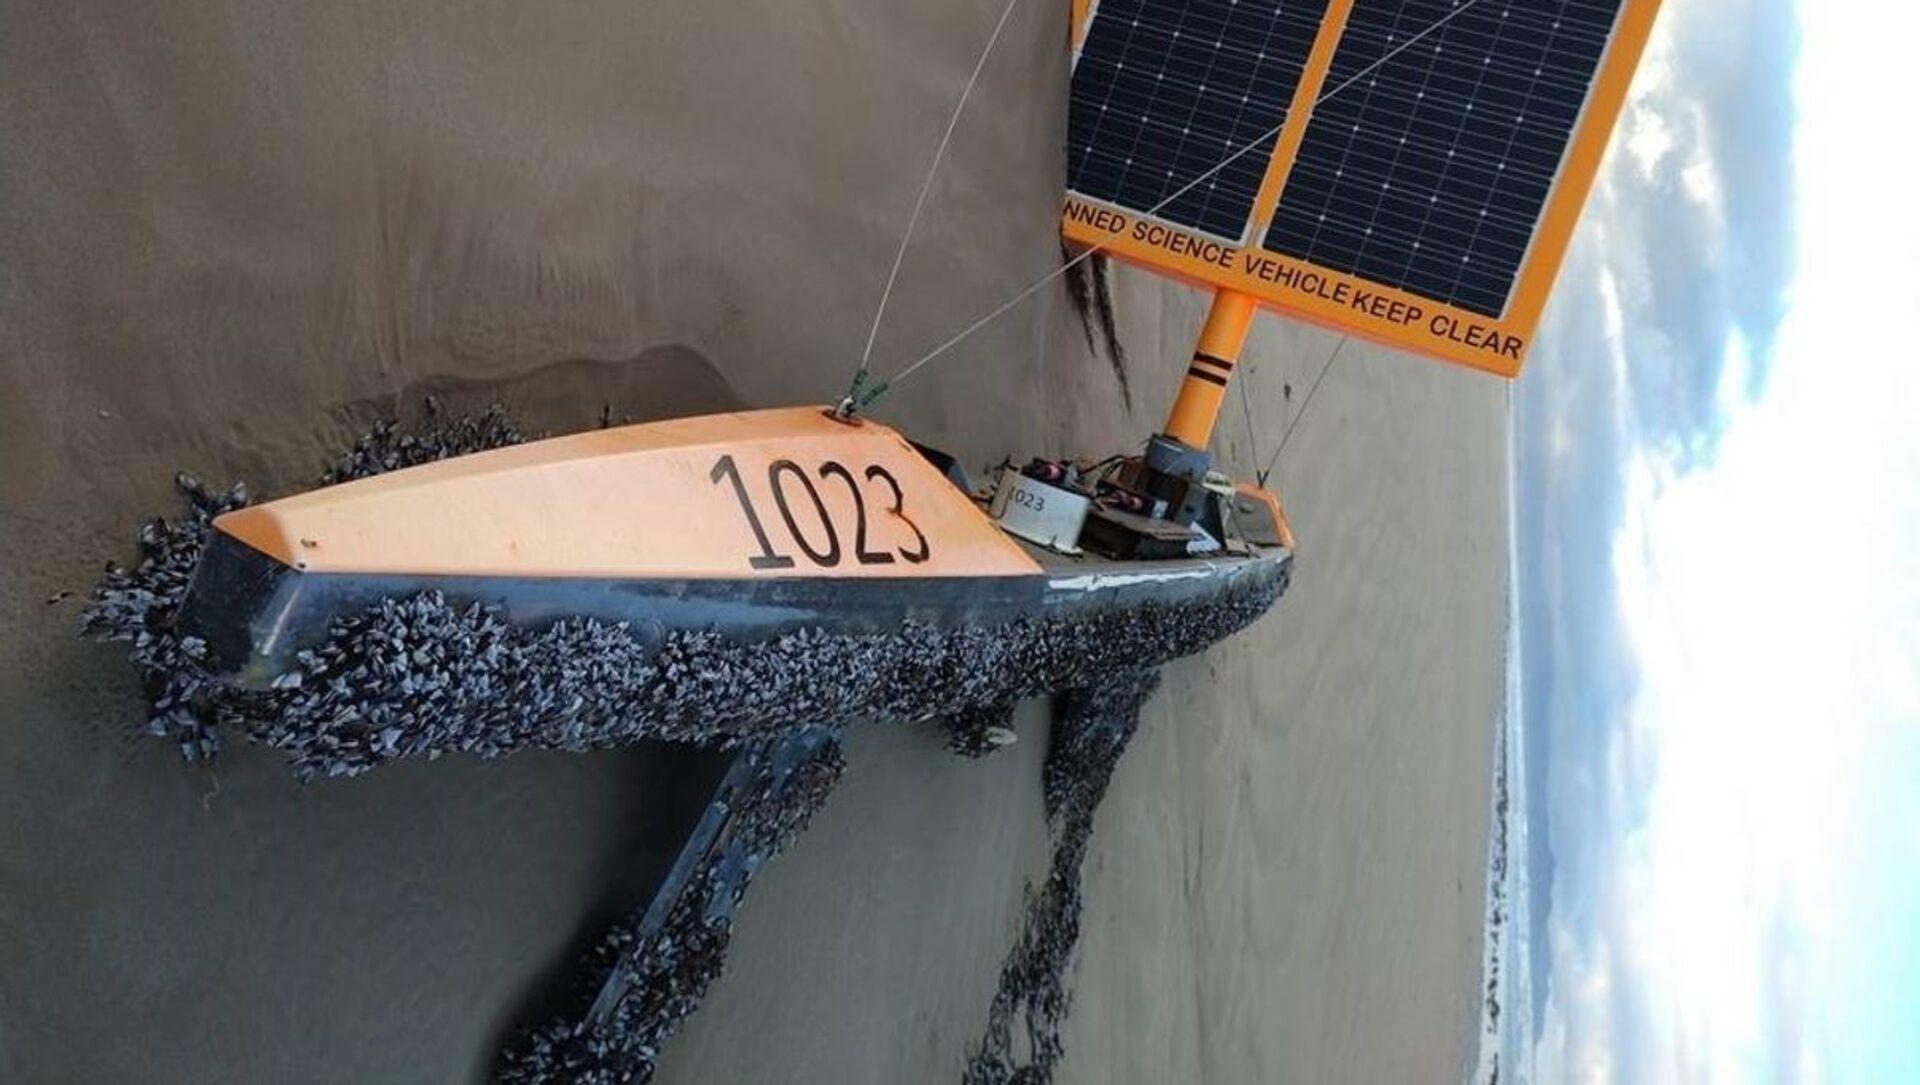 Australia, barca-fantasma - Sputnik Italia, 1920, 28.04.2021